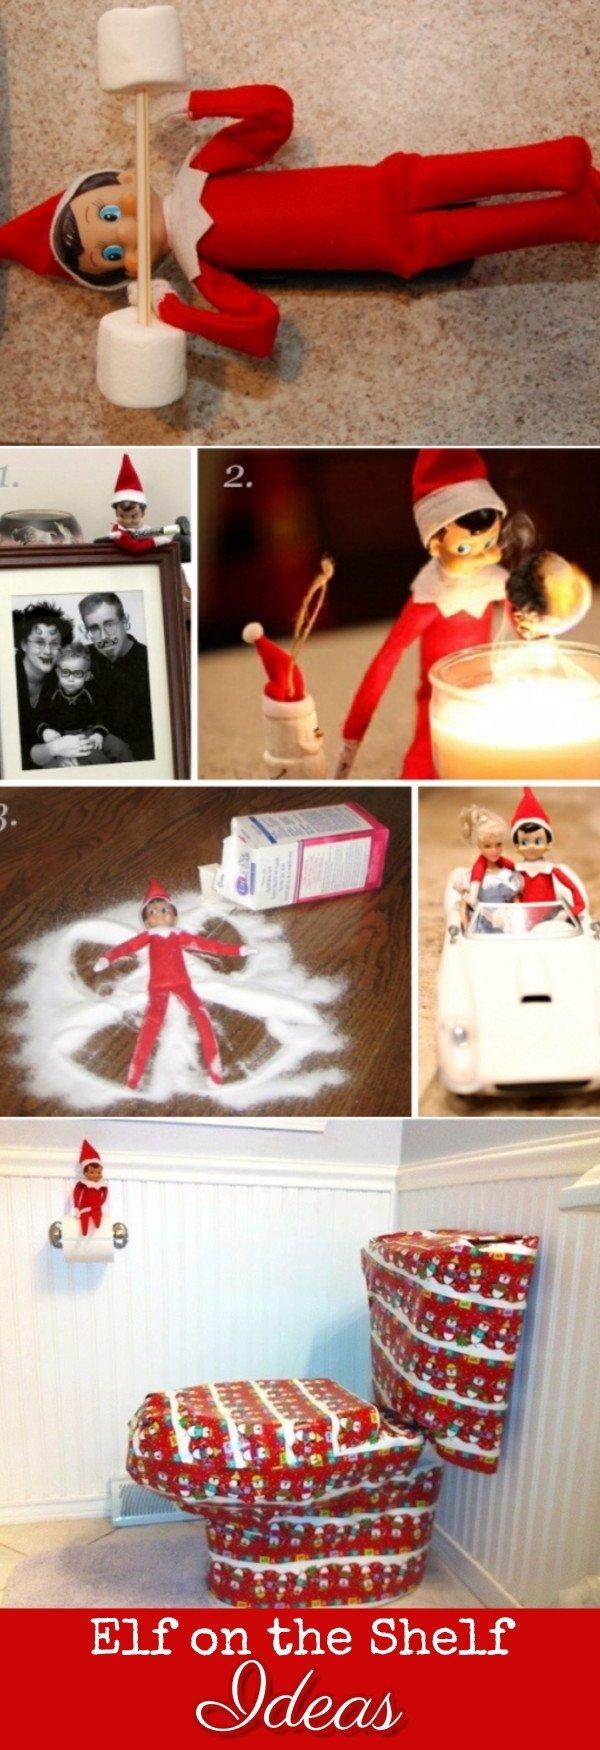 10 Stylish 101 Elf On The Shelf Ideas 10 elf on the shelf ideas for christmas 2017 crazy elf such pranks 7 2021